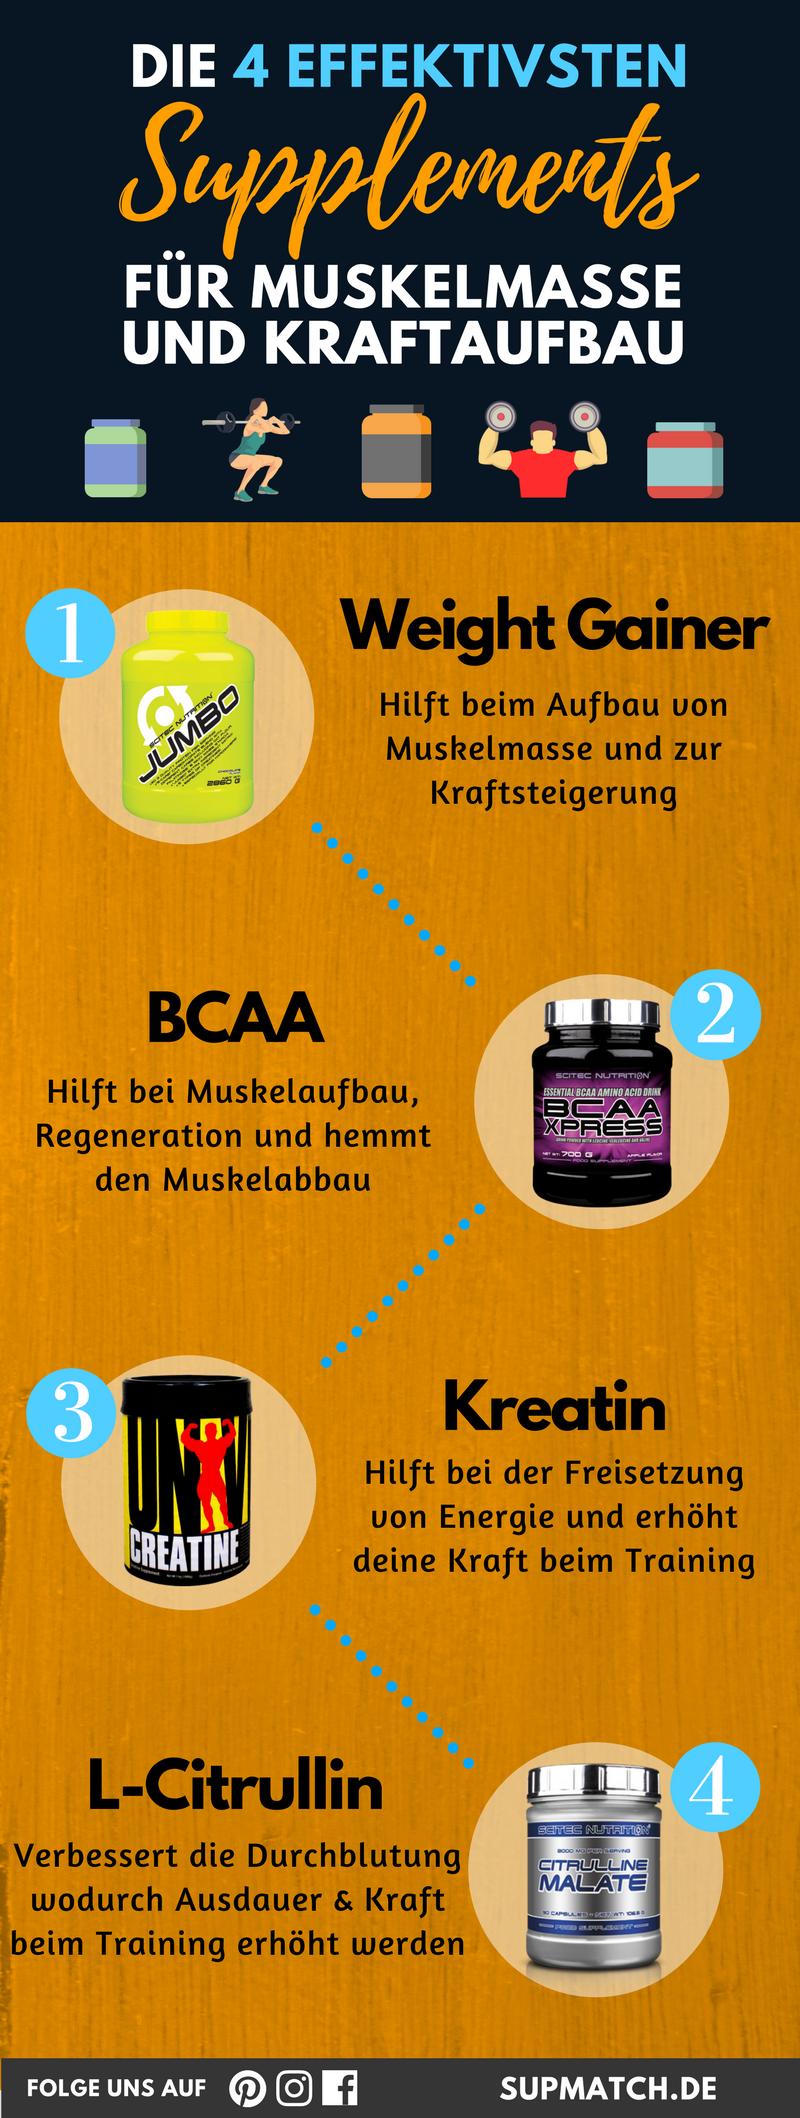 Die 4 Effektivsten Supplements Fur Muskelmasse Kraftaufbau Muskelaufbau Tipps Muskeln Ernahrung Muskelaufbau